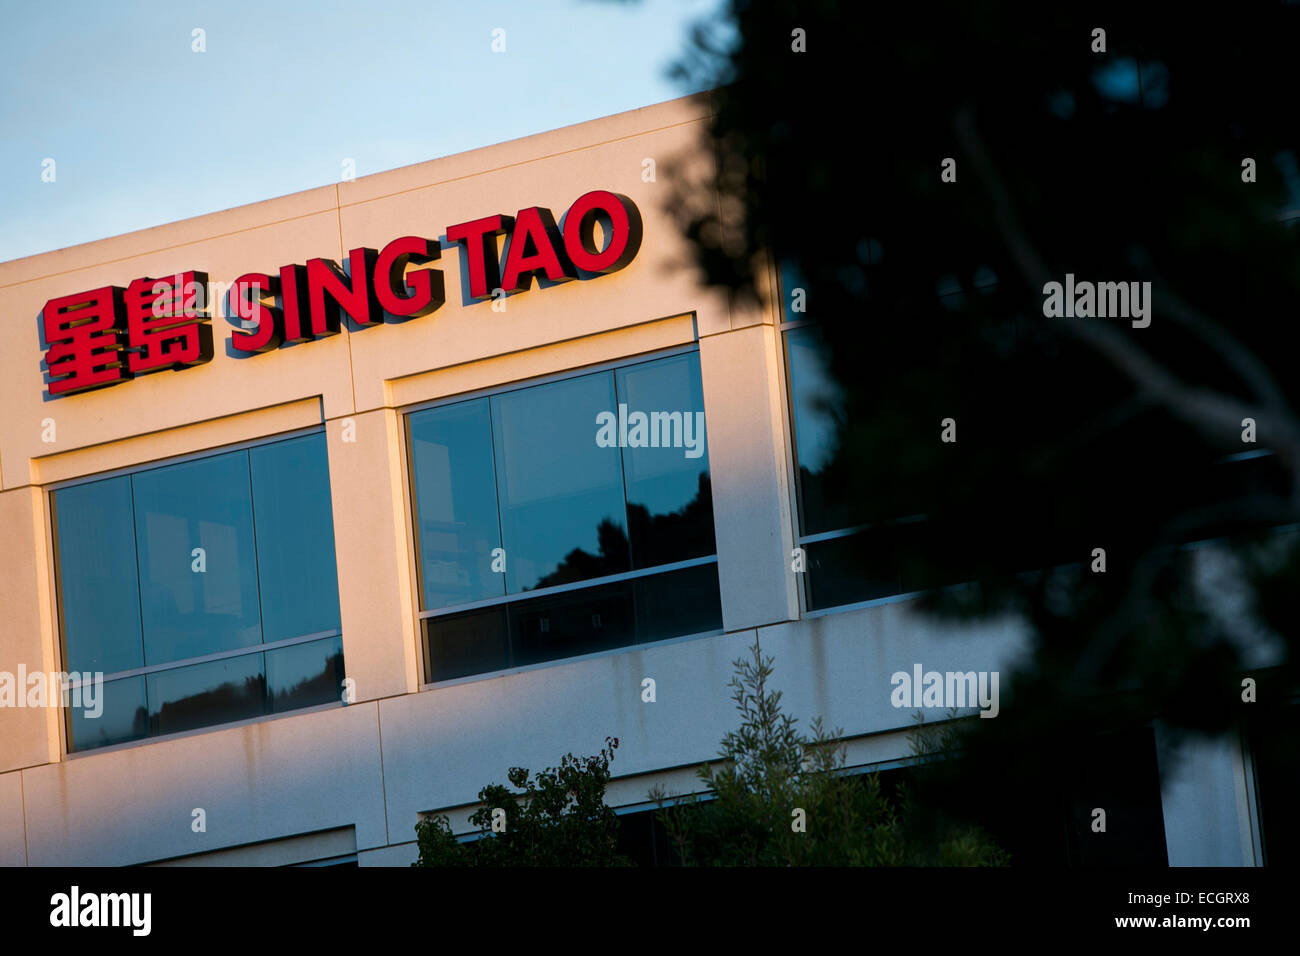 The San Francisco office of Hong Kong newspaper Sing Tao. - Stock Image